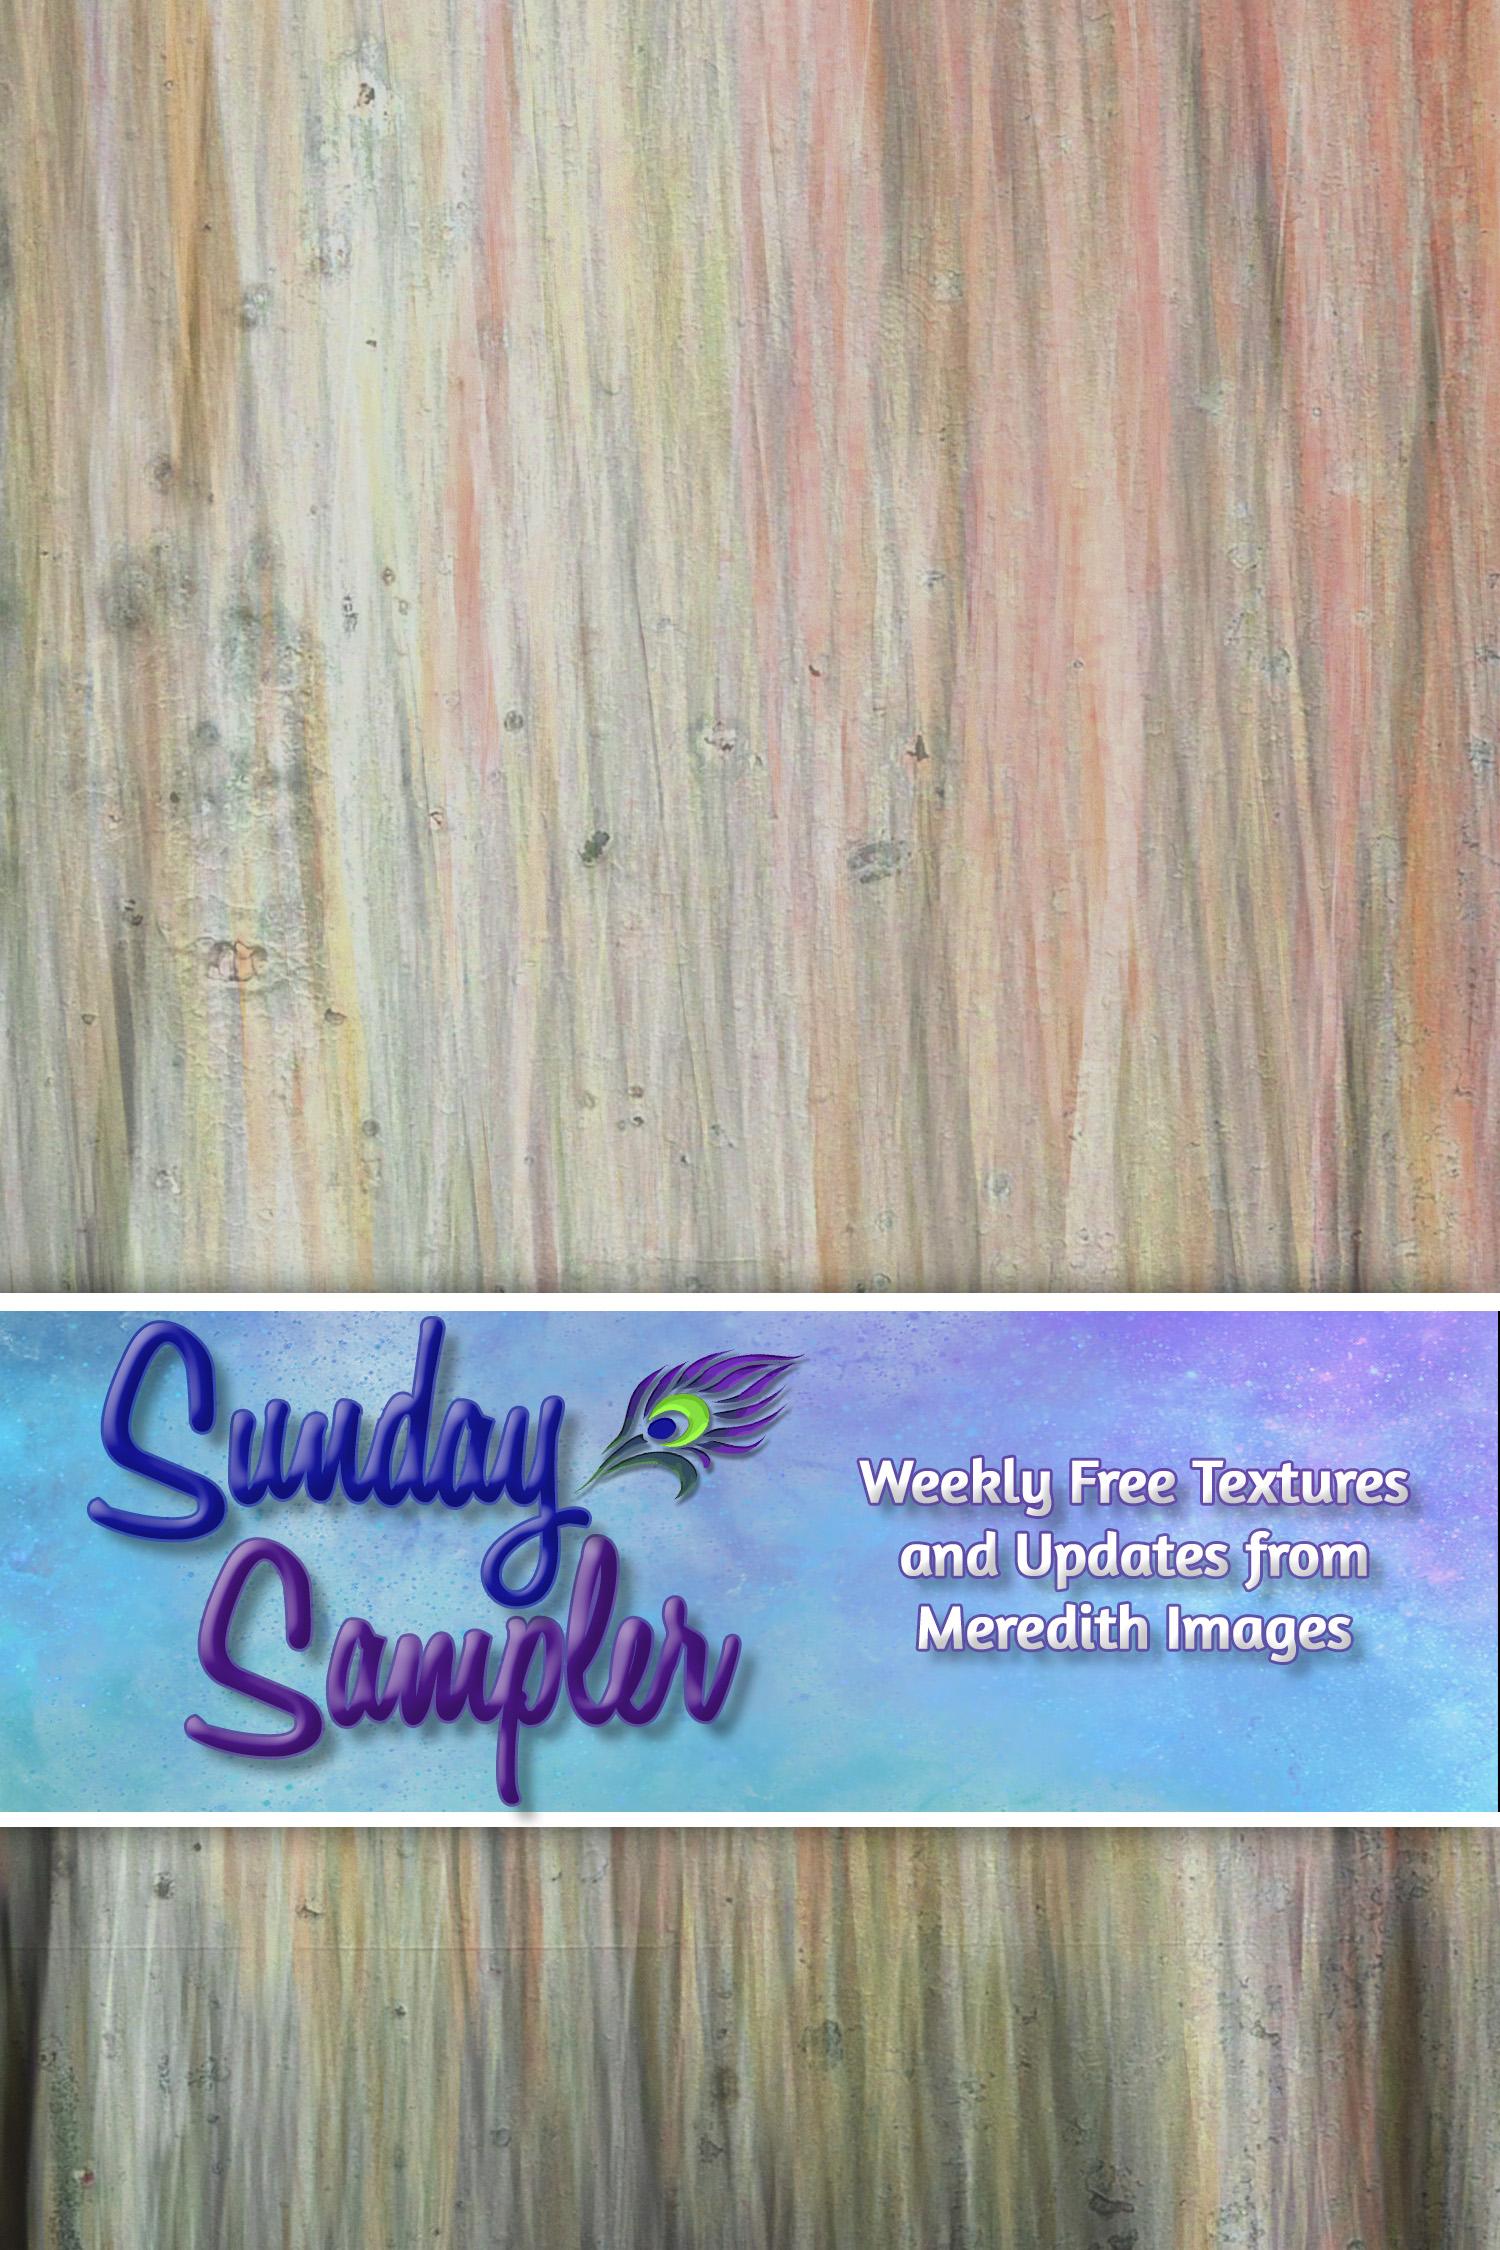 Sunday Sampler October 24